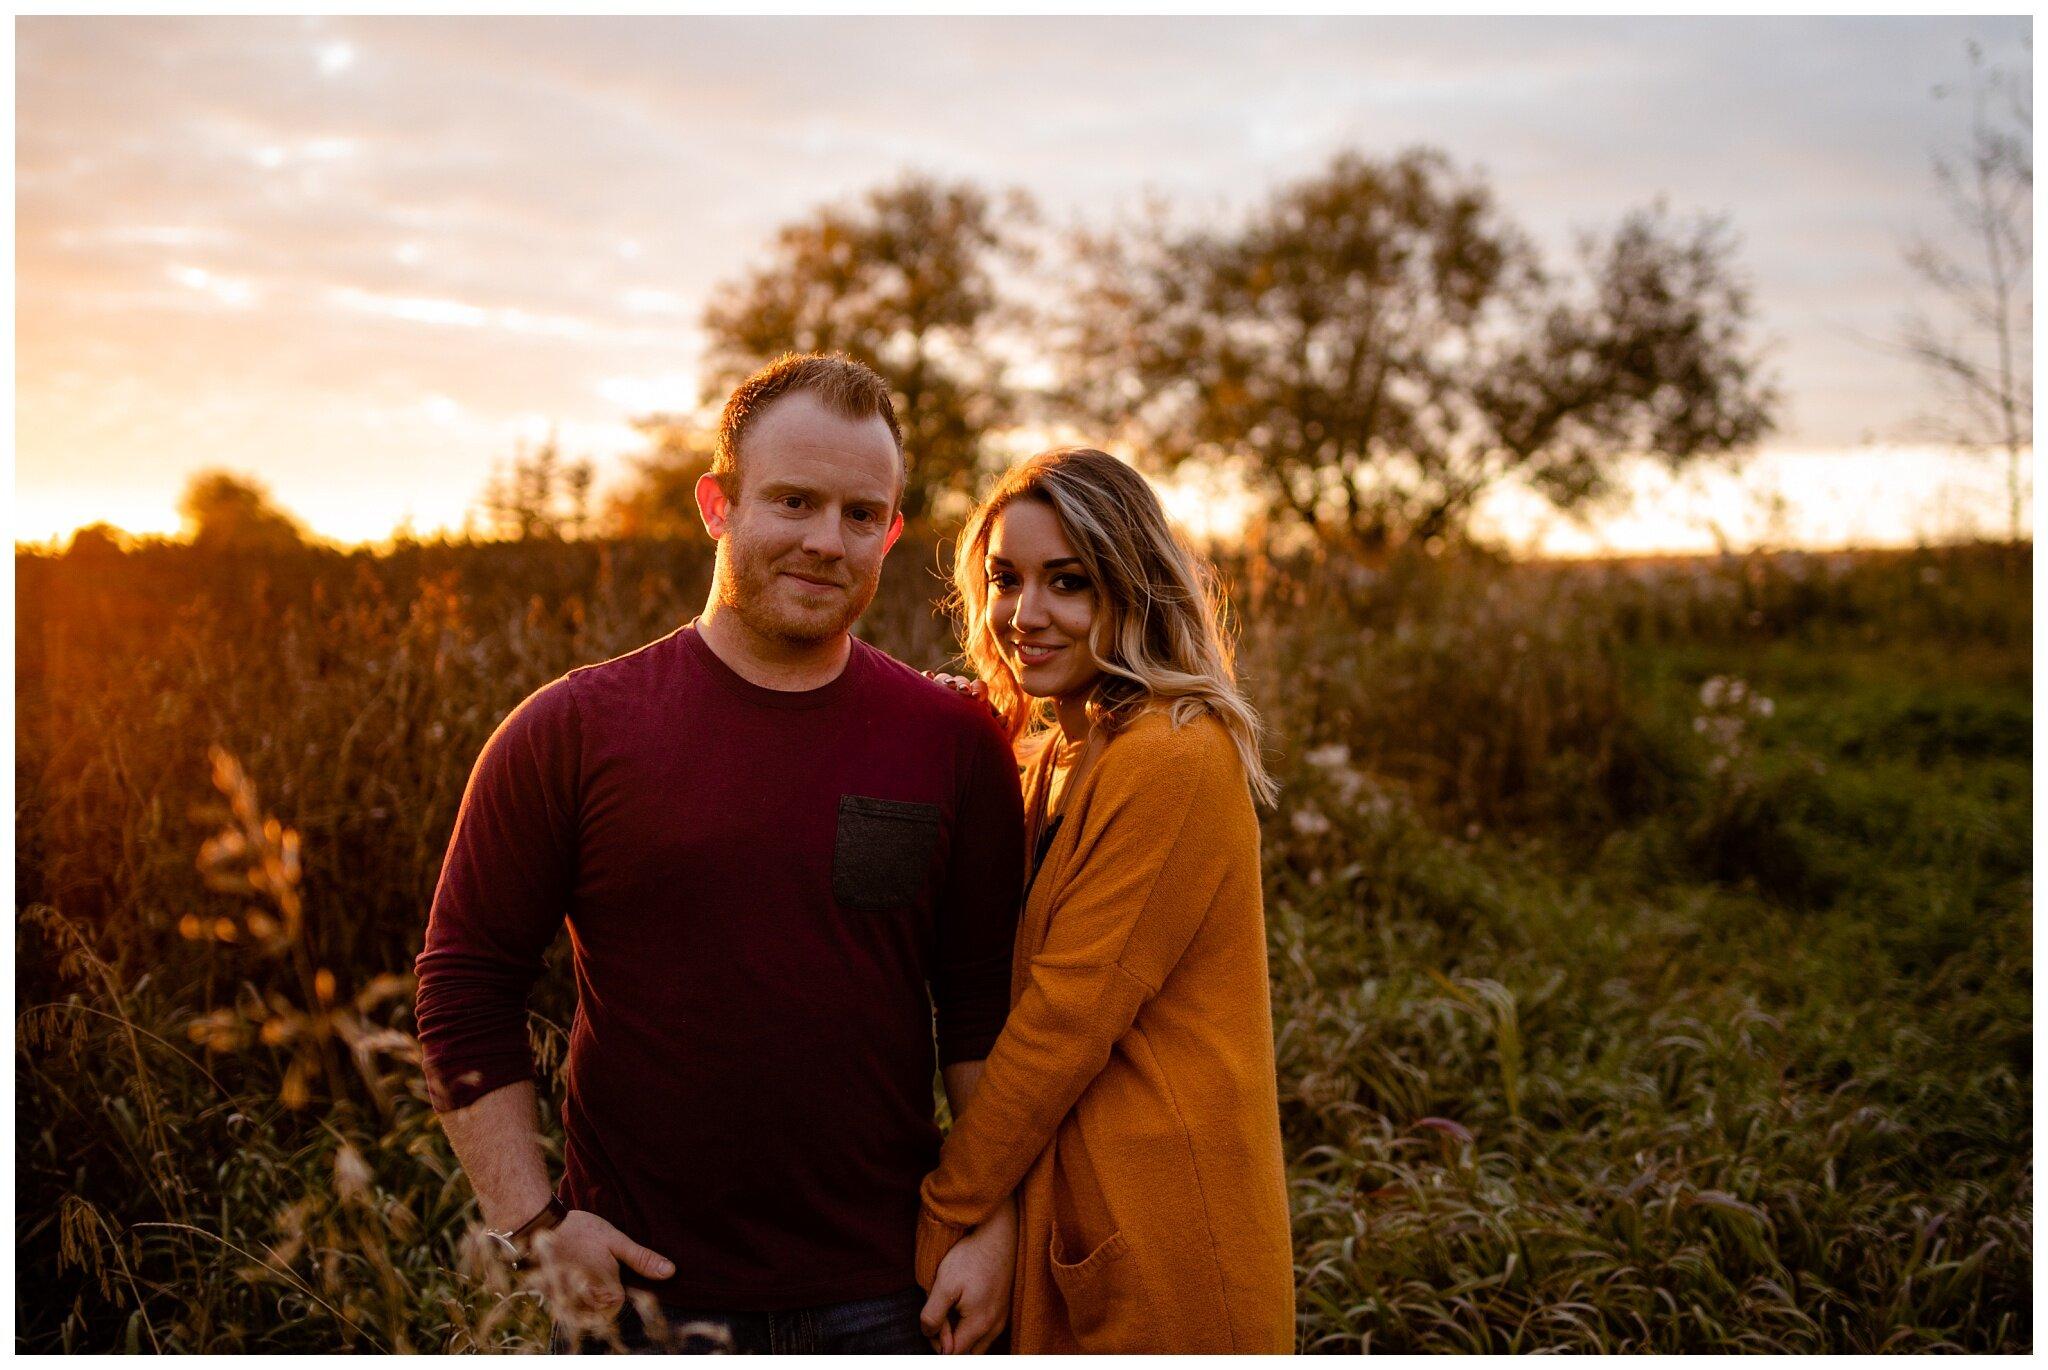 Edmonton Engagement Photographer Romantic Couples Photos Local YEG Strathcona County_0022.jpg